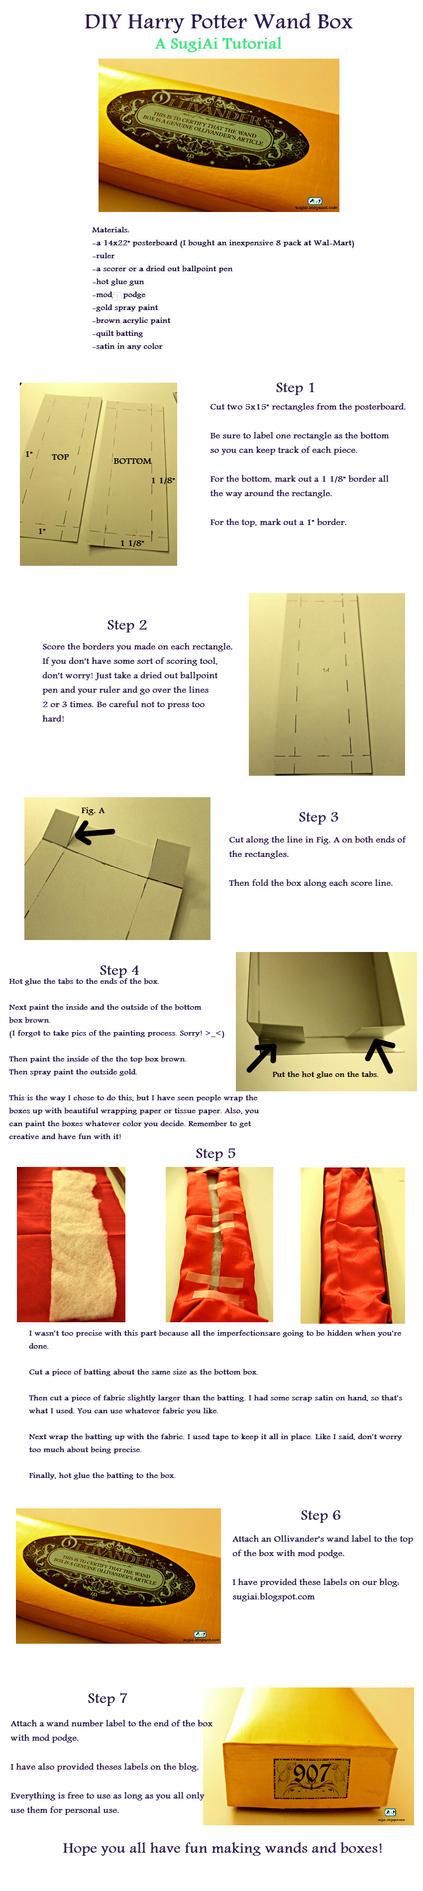 Wand Box Tutorial by SugiAi